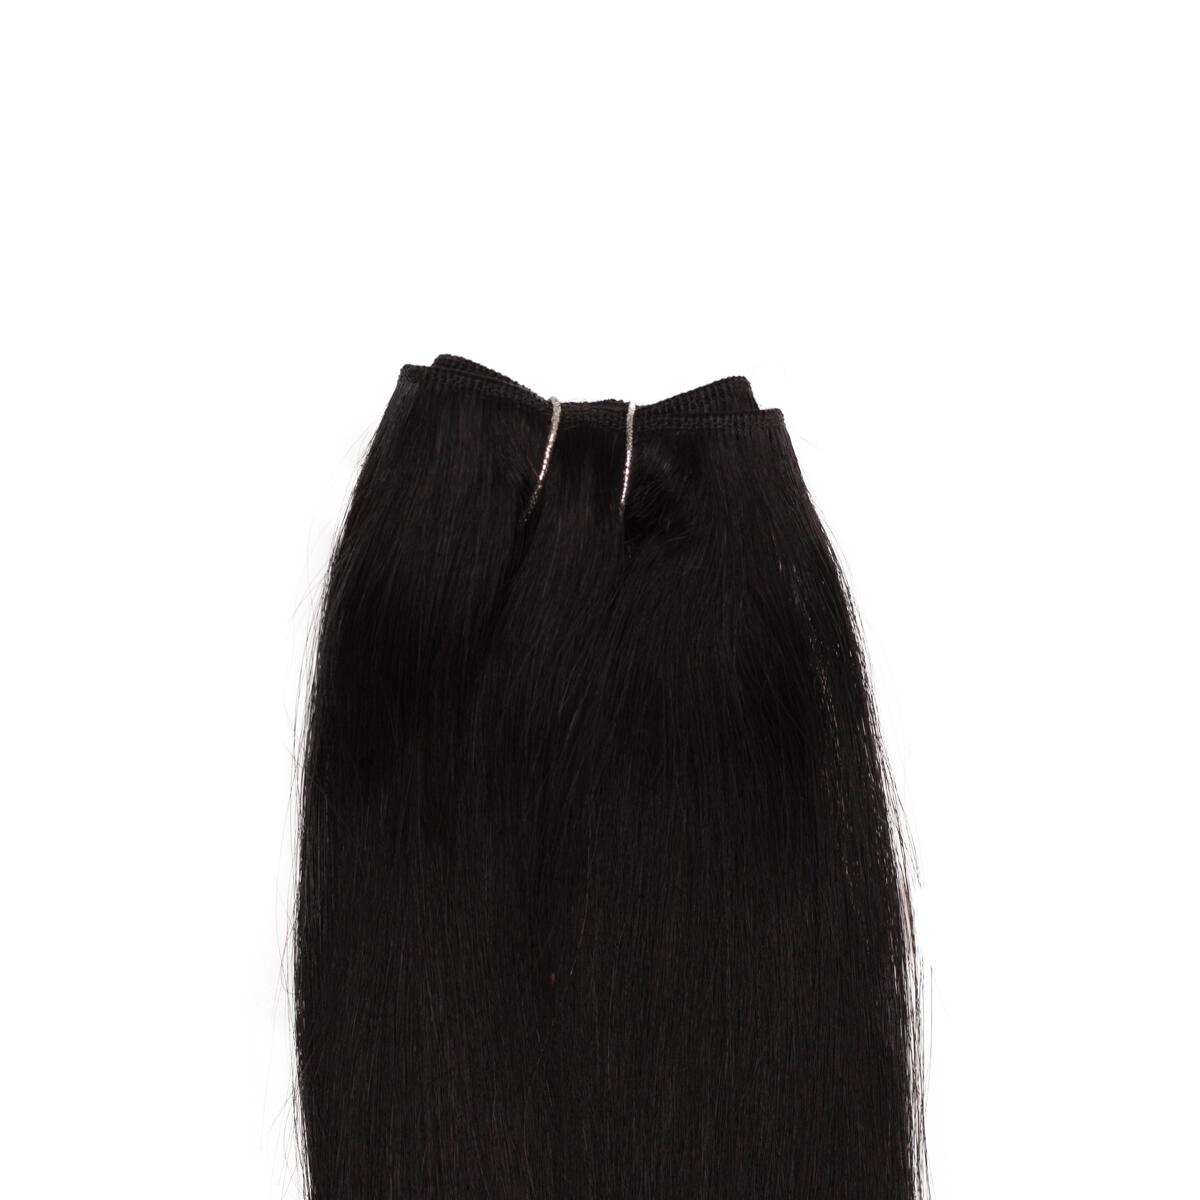 Hair Weft 1.0 Black 50 cm